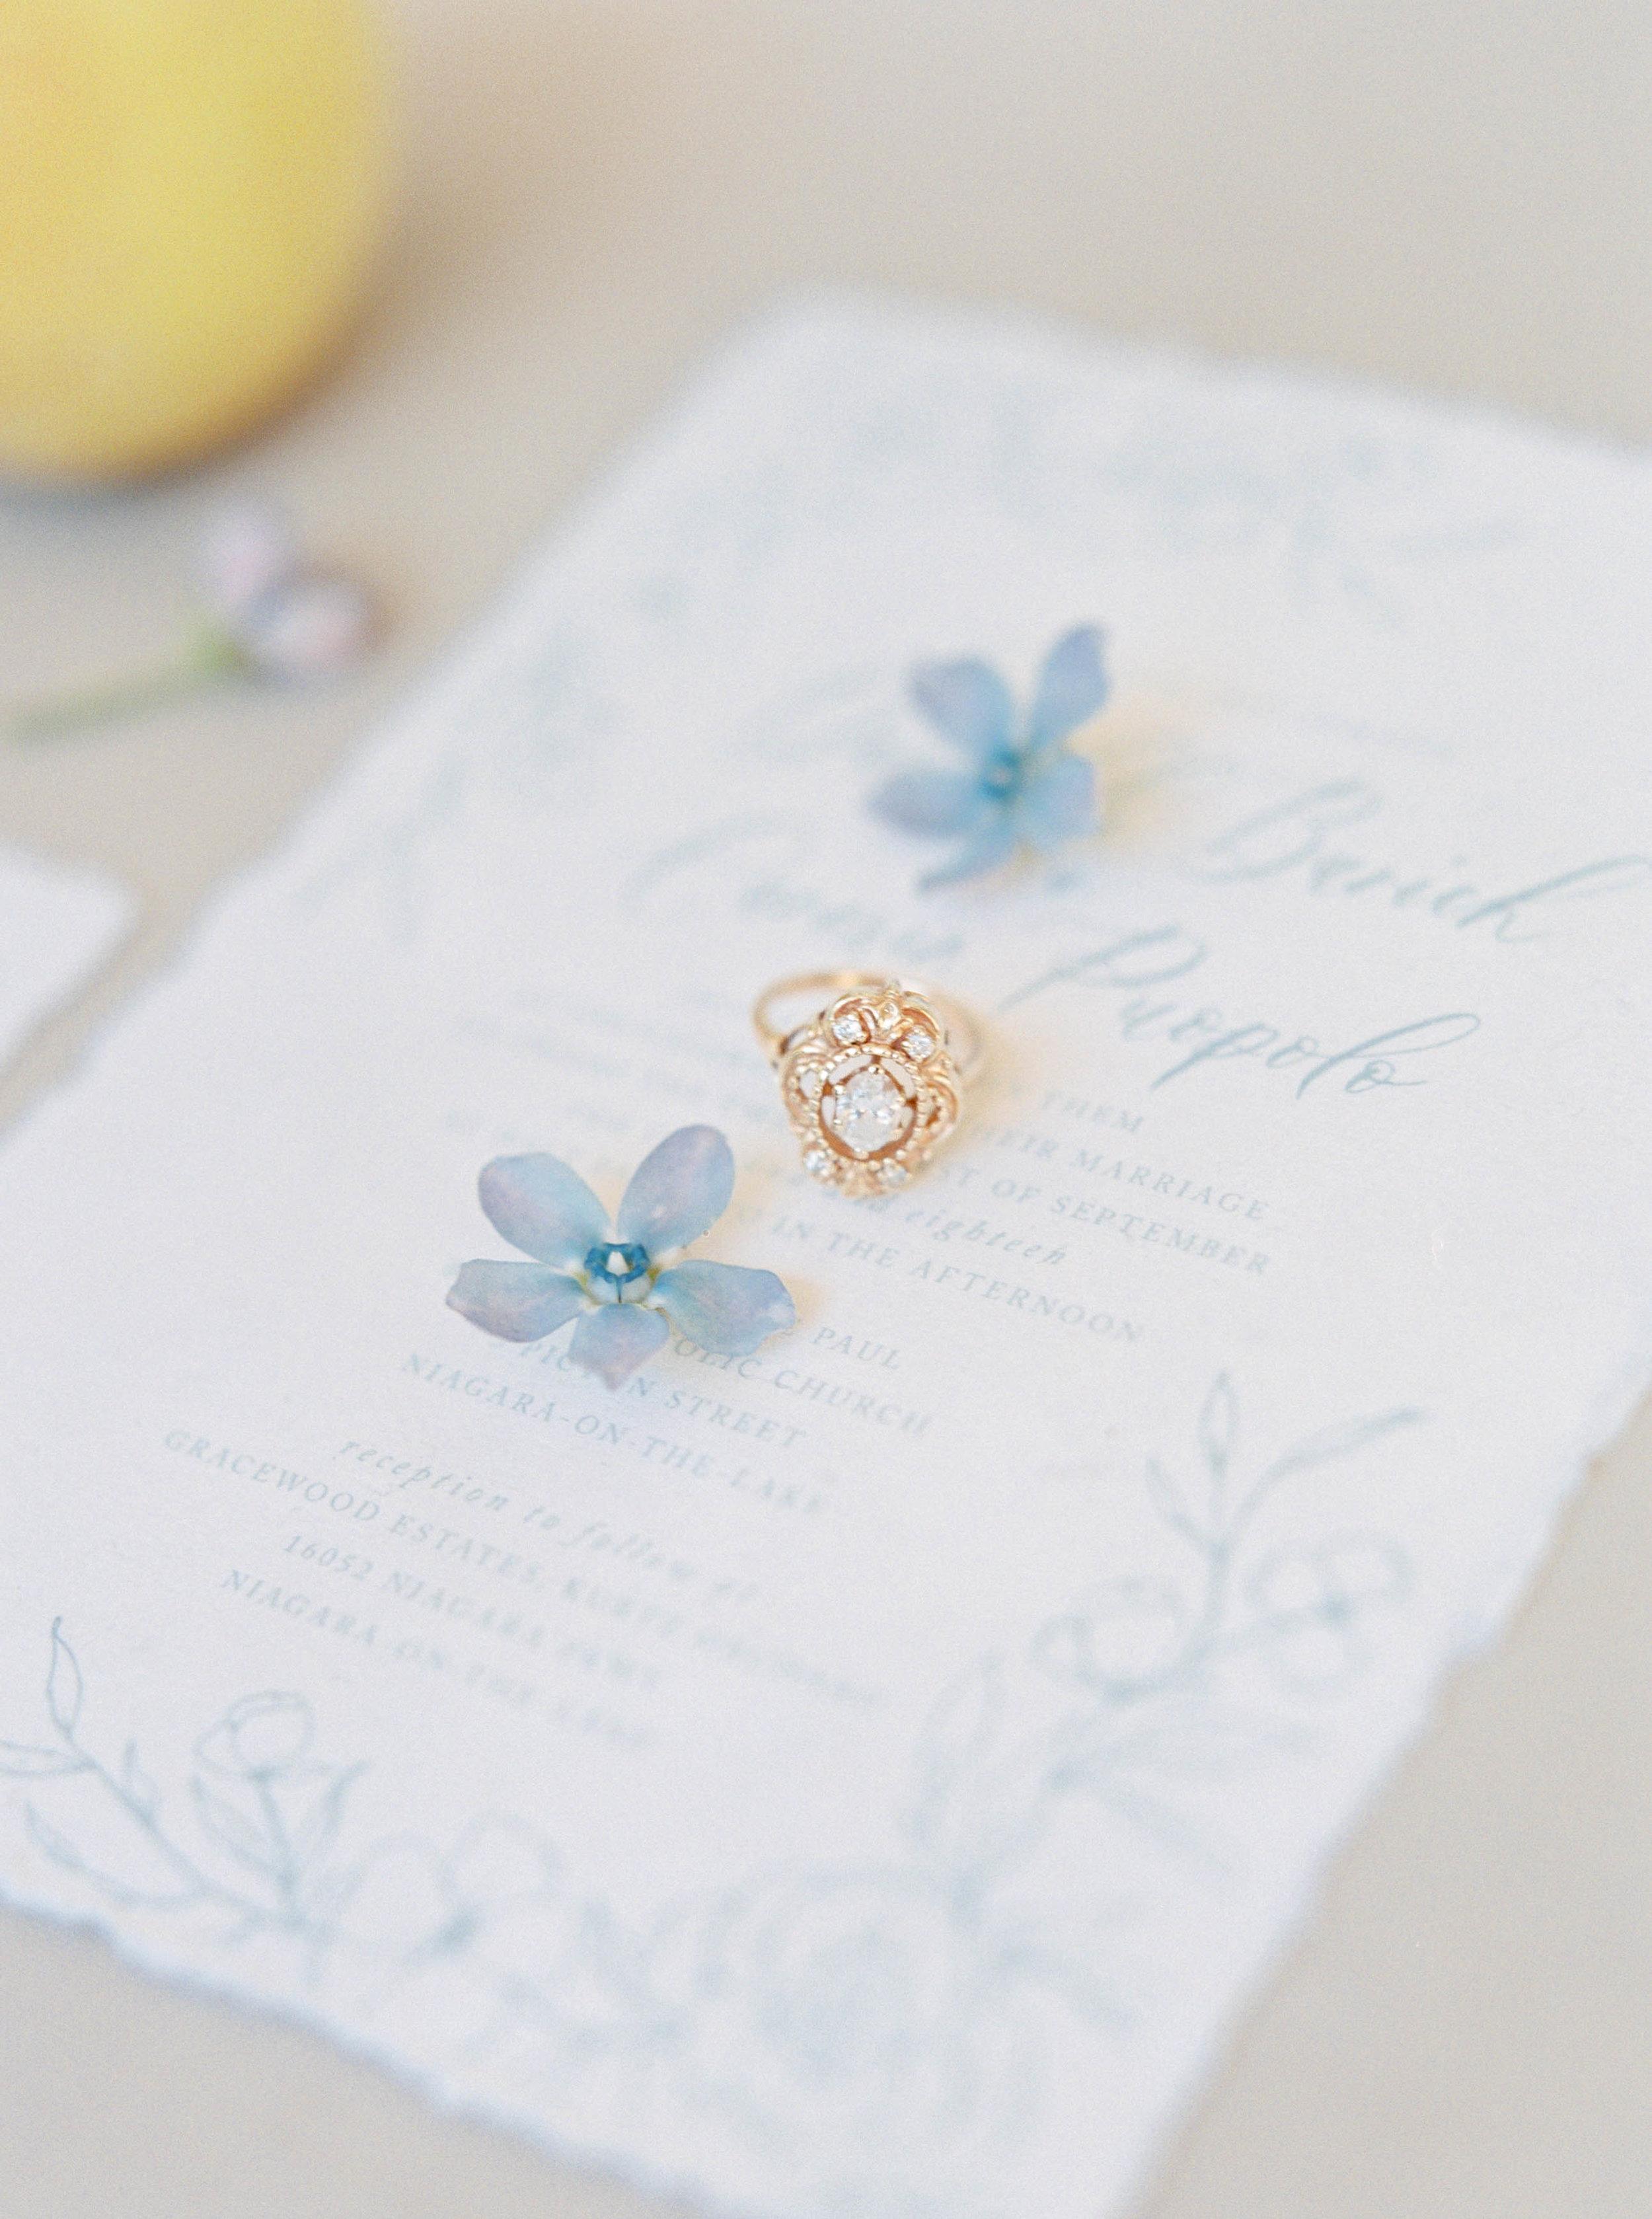 kurtz-gracewood-wedding-soft-airy-photographer-white-book-danielle-carmen-1-2.jpg